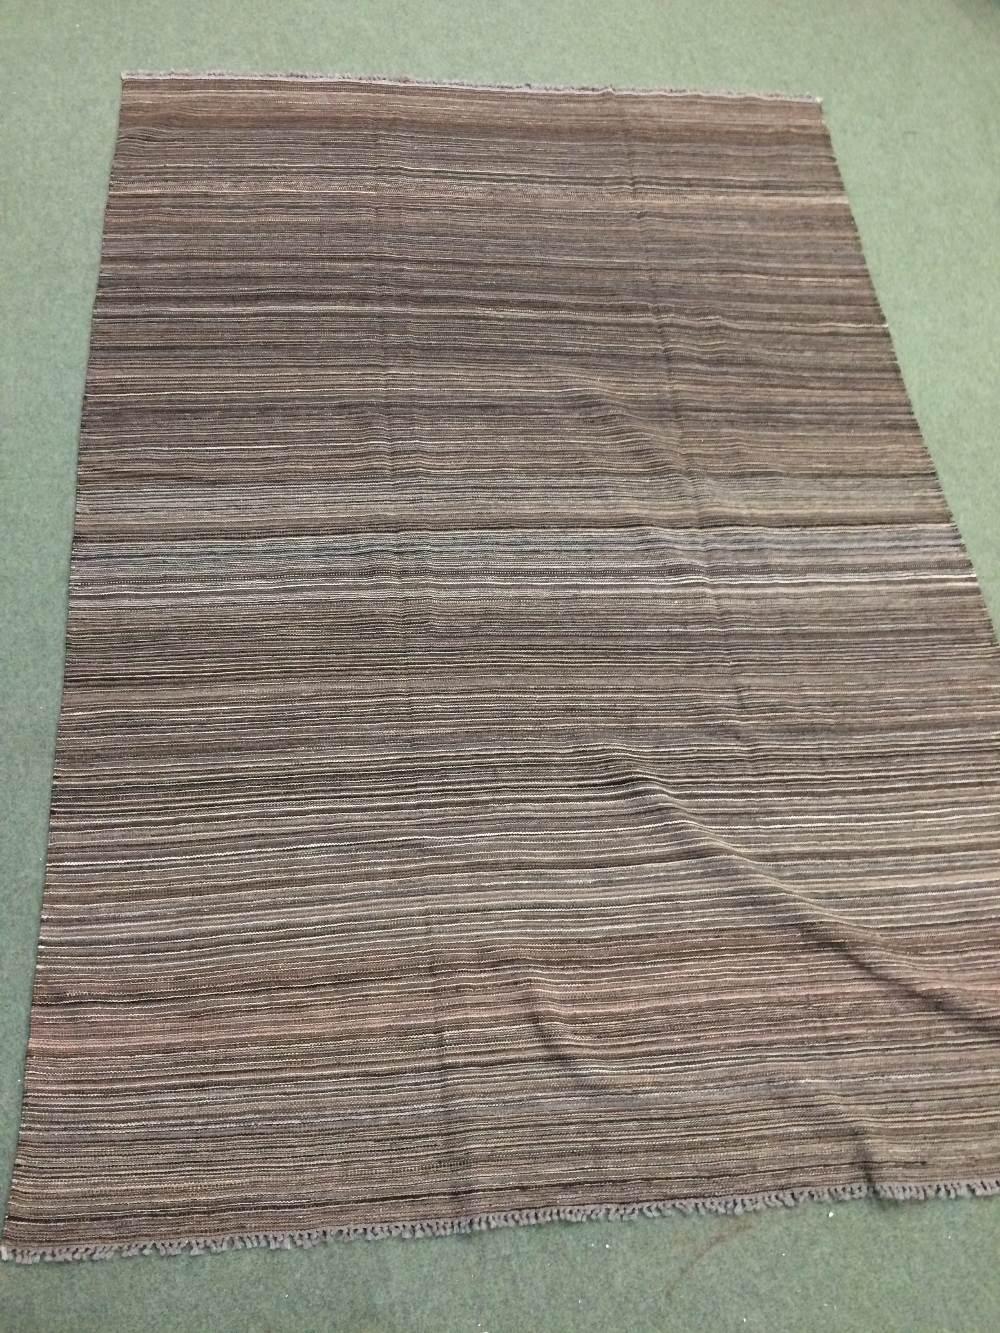 Lot 718 - Contemporary kilim 2.9 X 1.92m